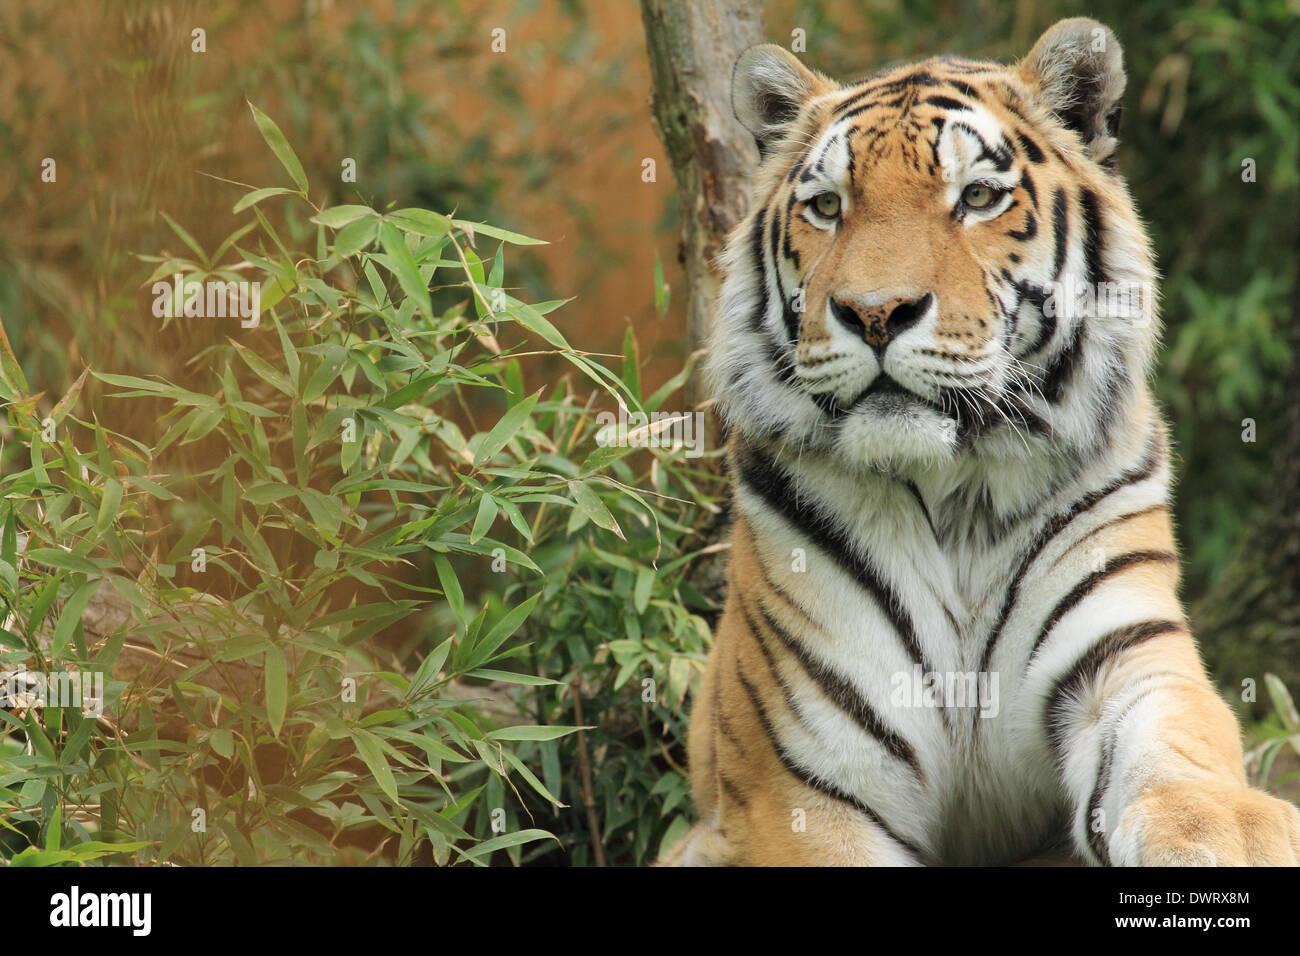 Tigre feroz Imagen De Stock